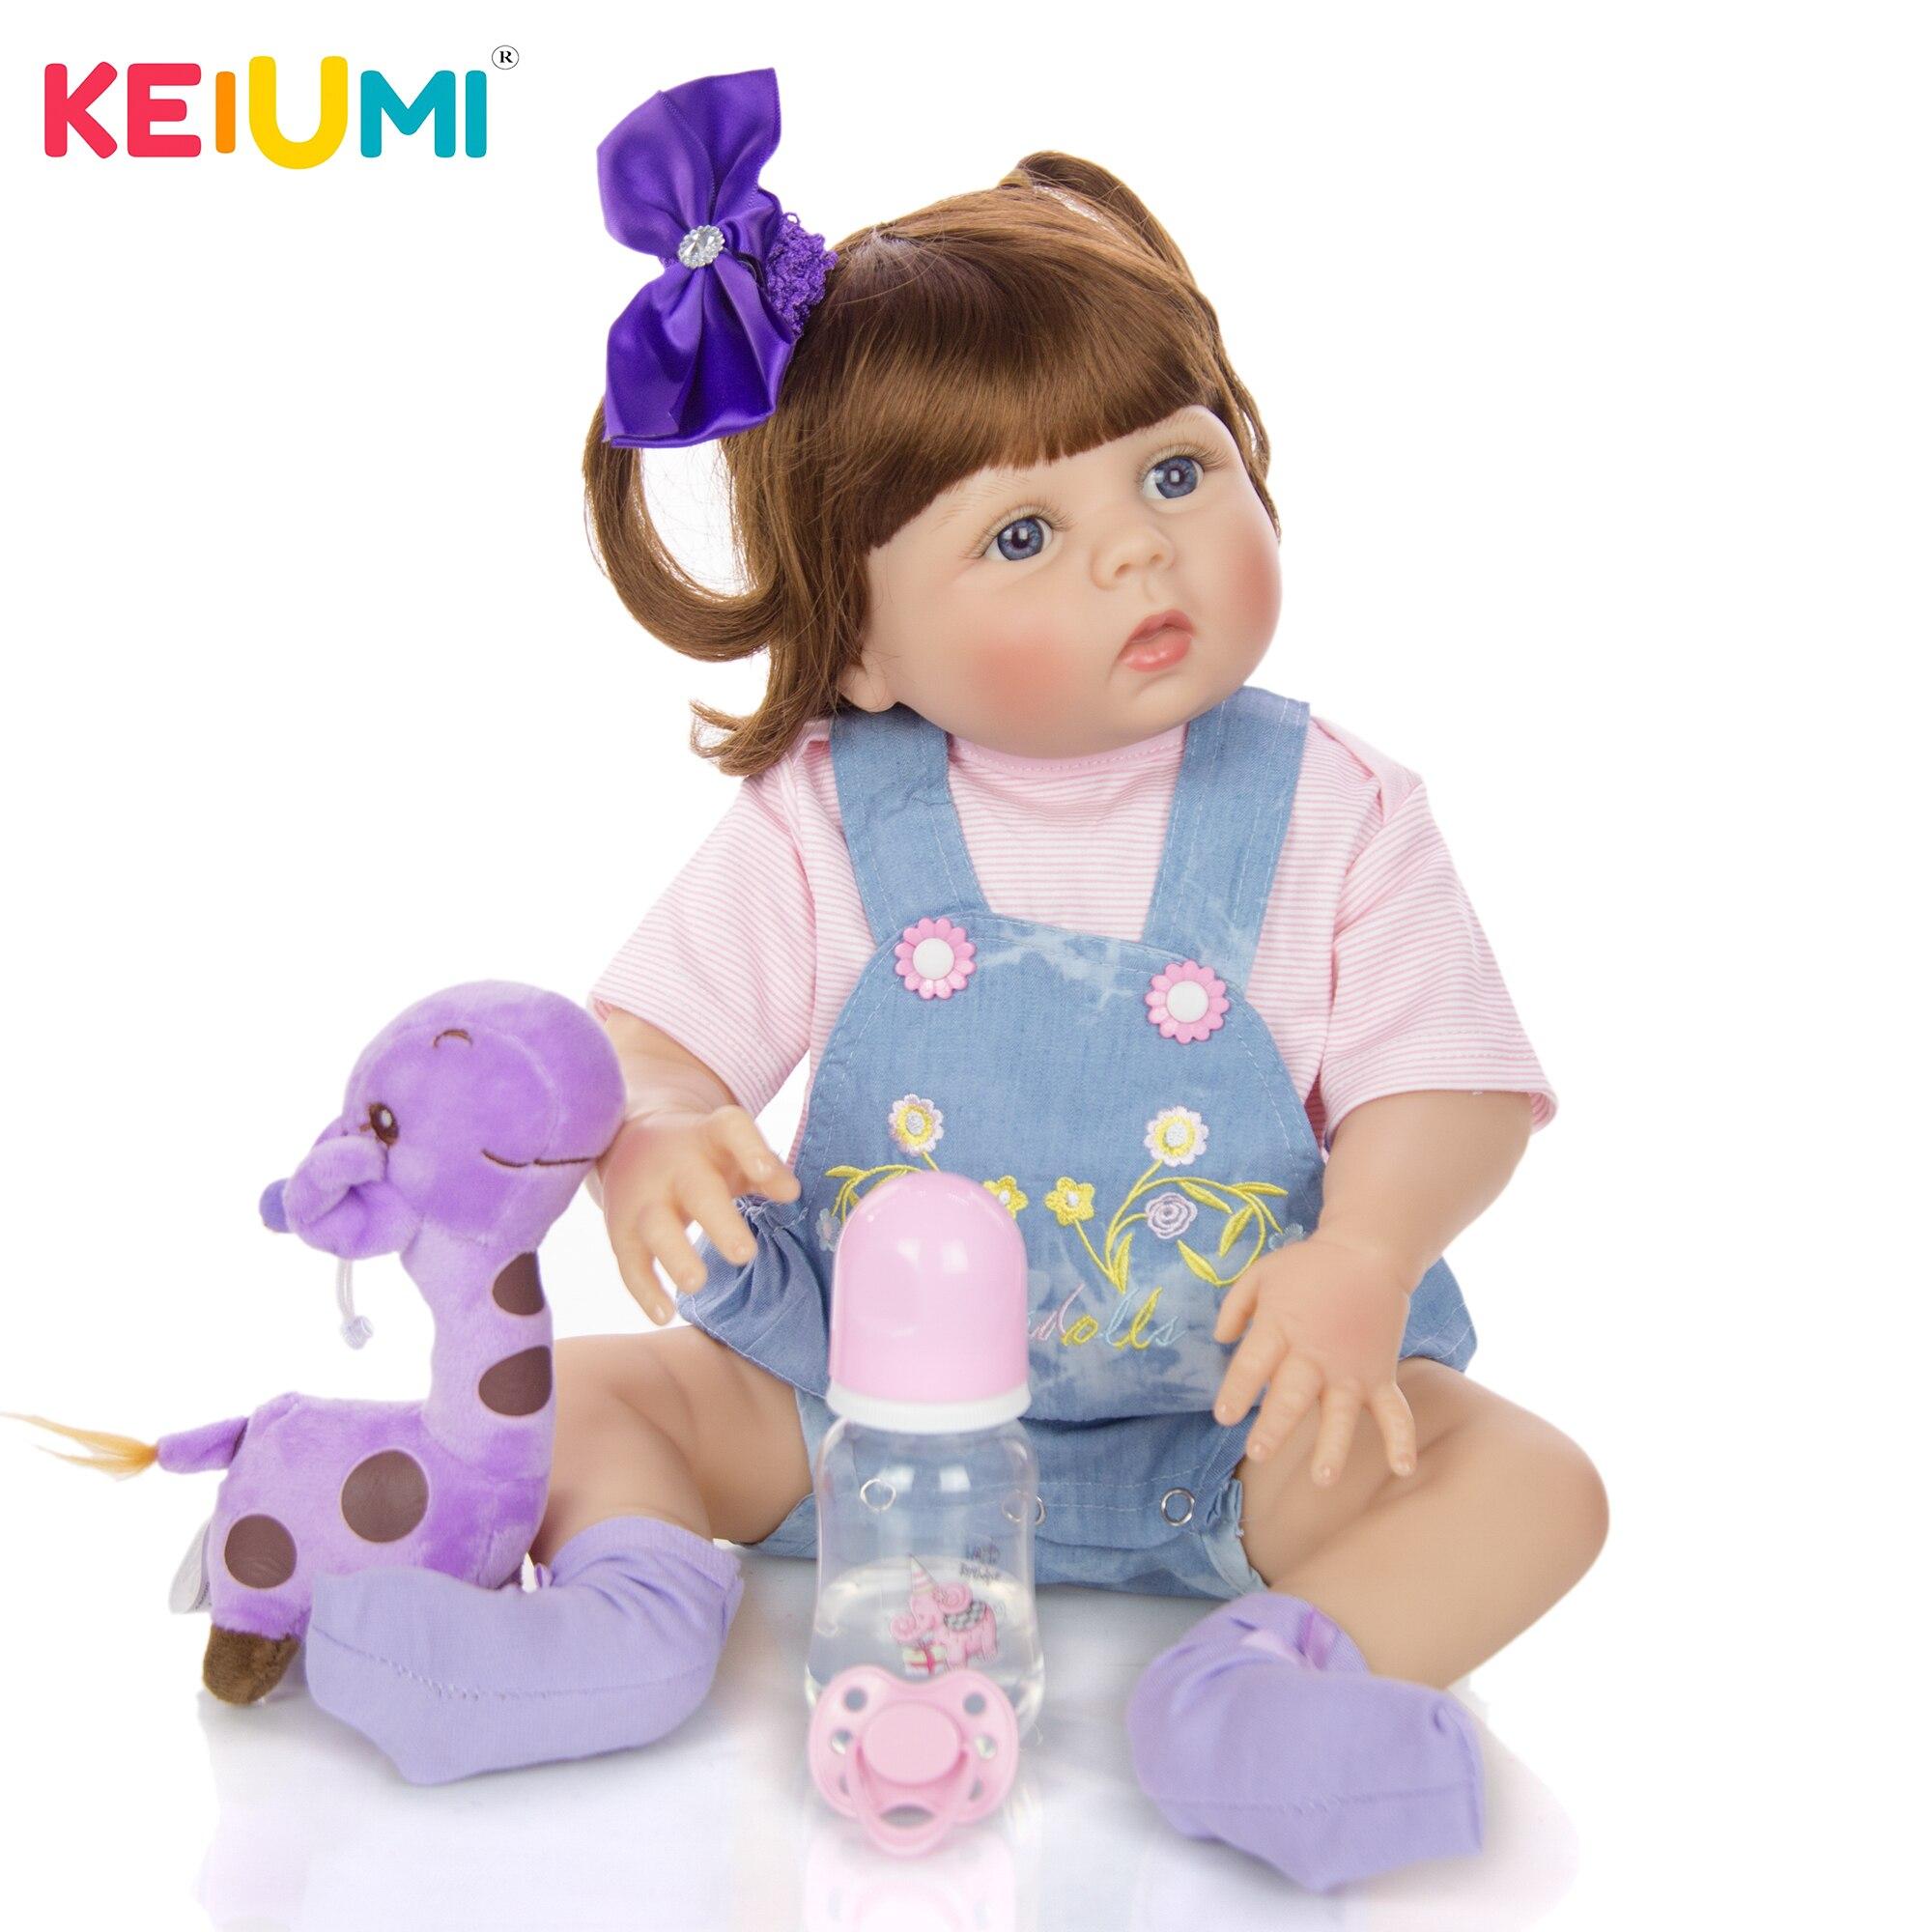 Lifelike 23'' 57cm Reborn Boneca Doll Full Silicone Vinyl Body Lovely bebe Newborn Doll Toy For Girl Birthday Christmas Present